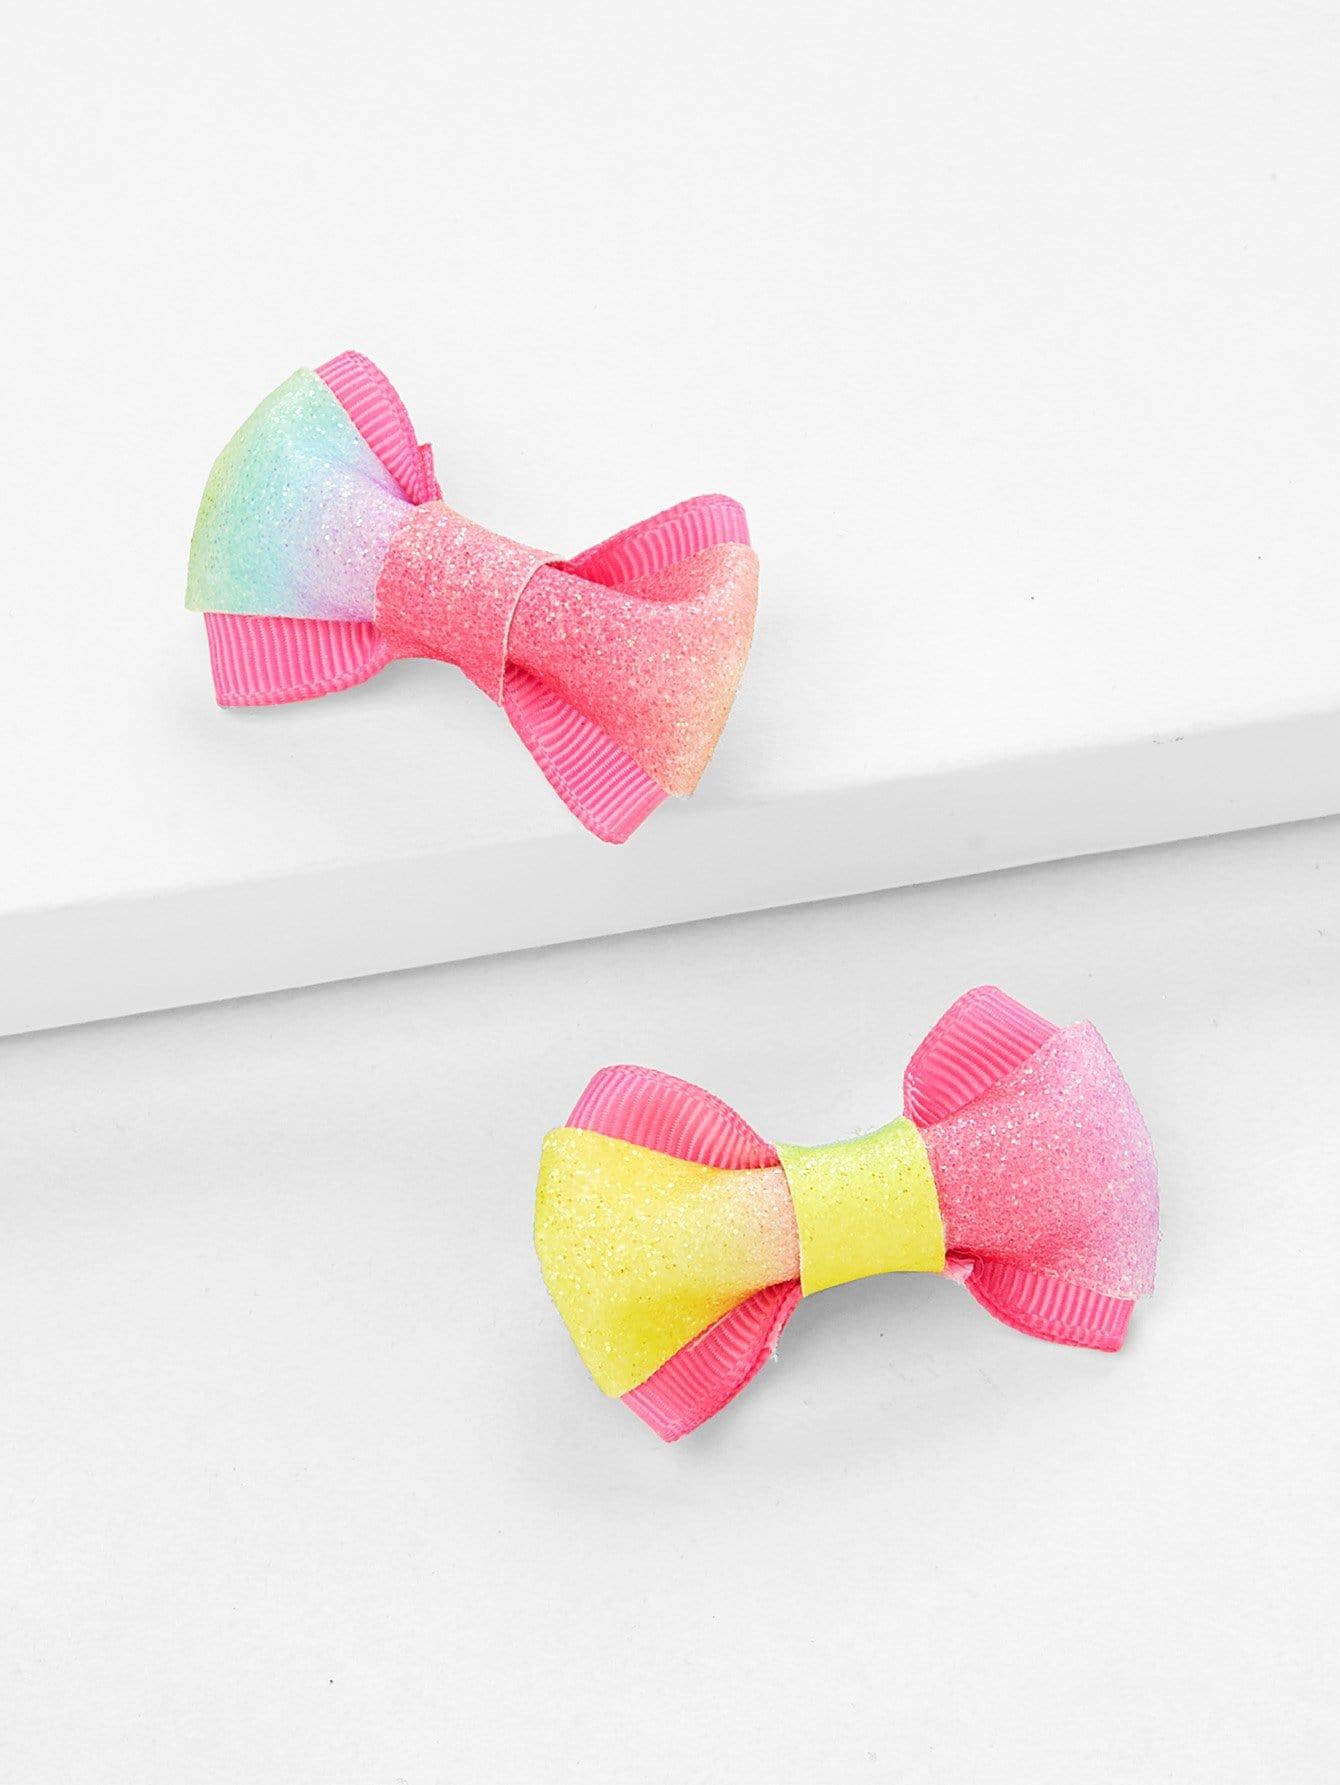 Glitter Bow Hair Clip 2pcs hair clip women baby girl big glitter hair bow kids hairpins hair clips for children hair accessories toddler headwear